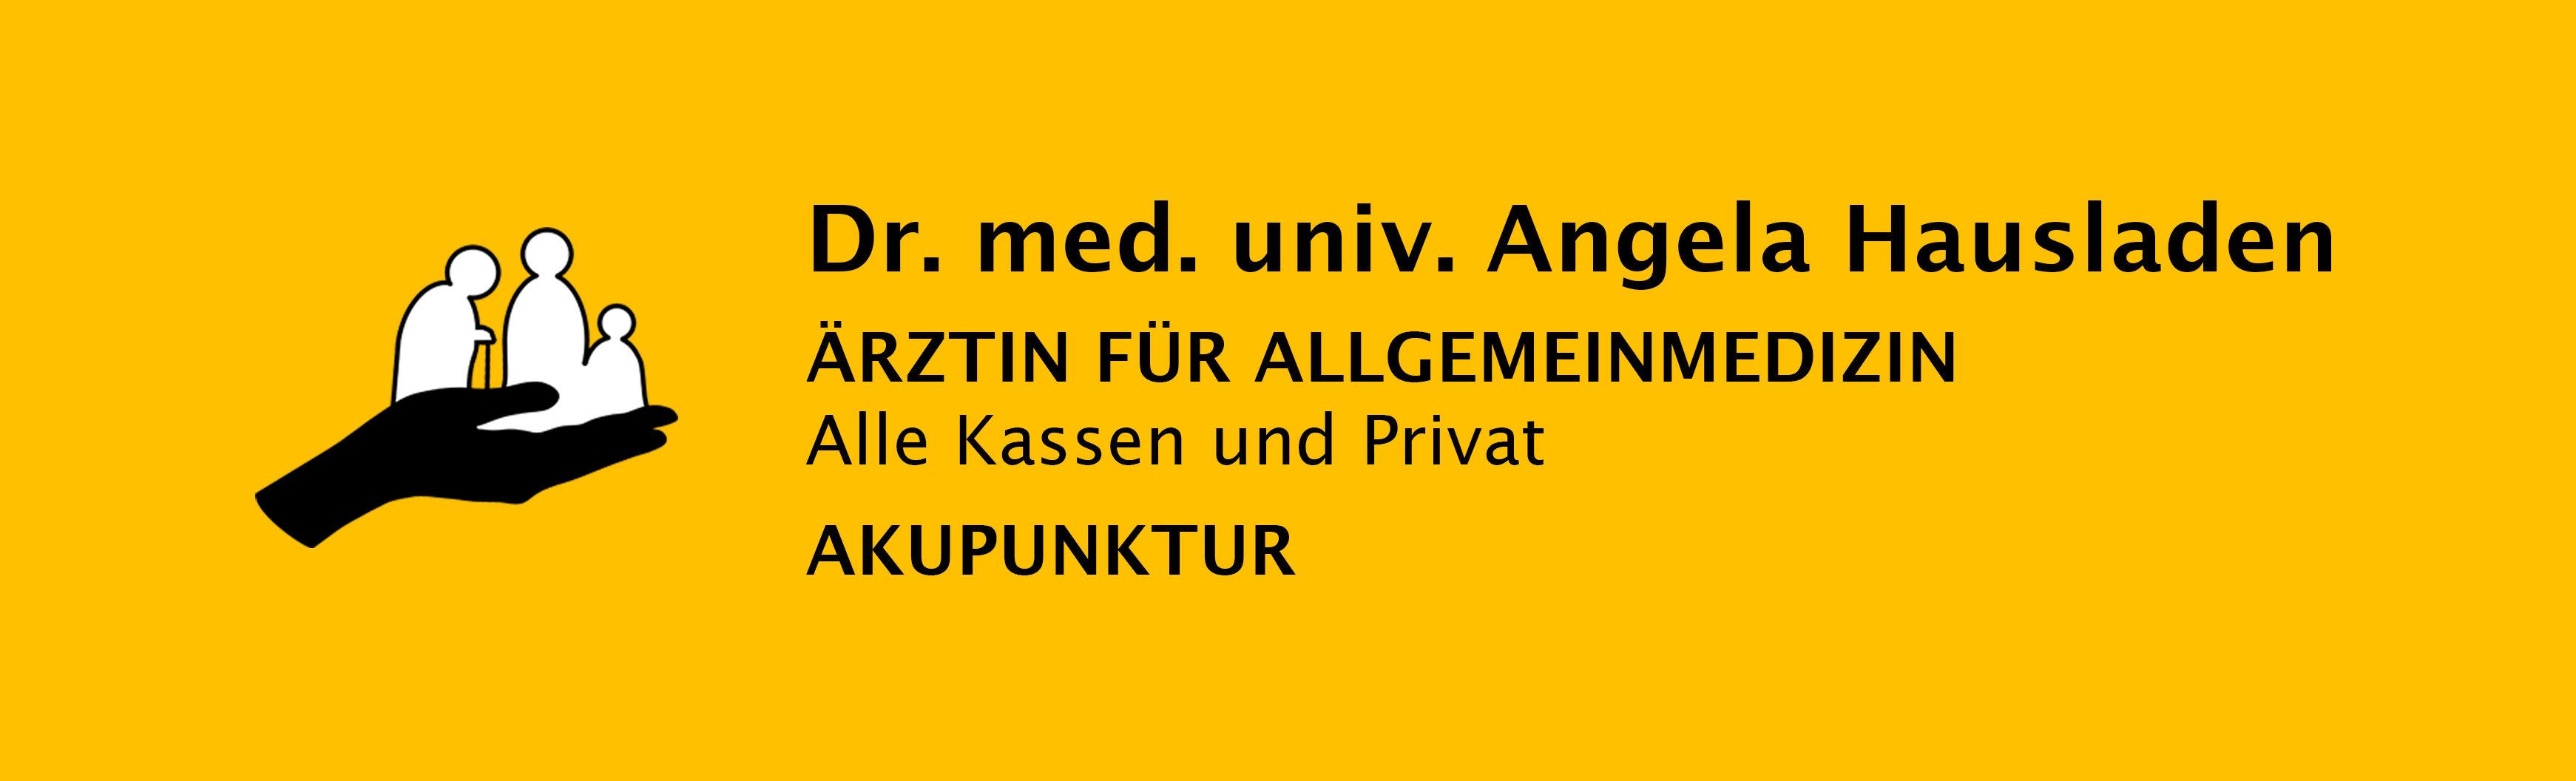 Dr. Angela Hausladen